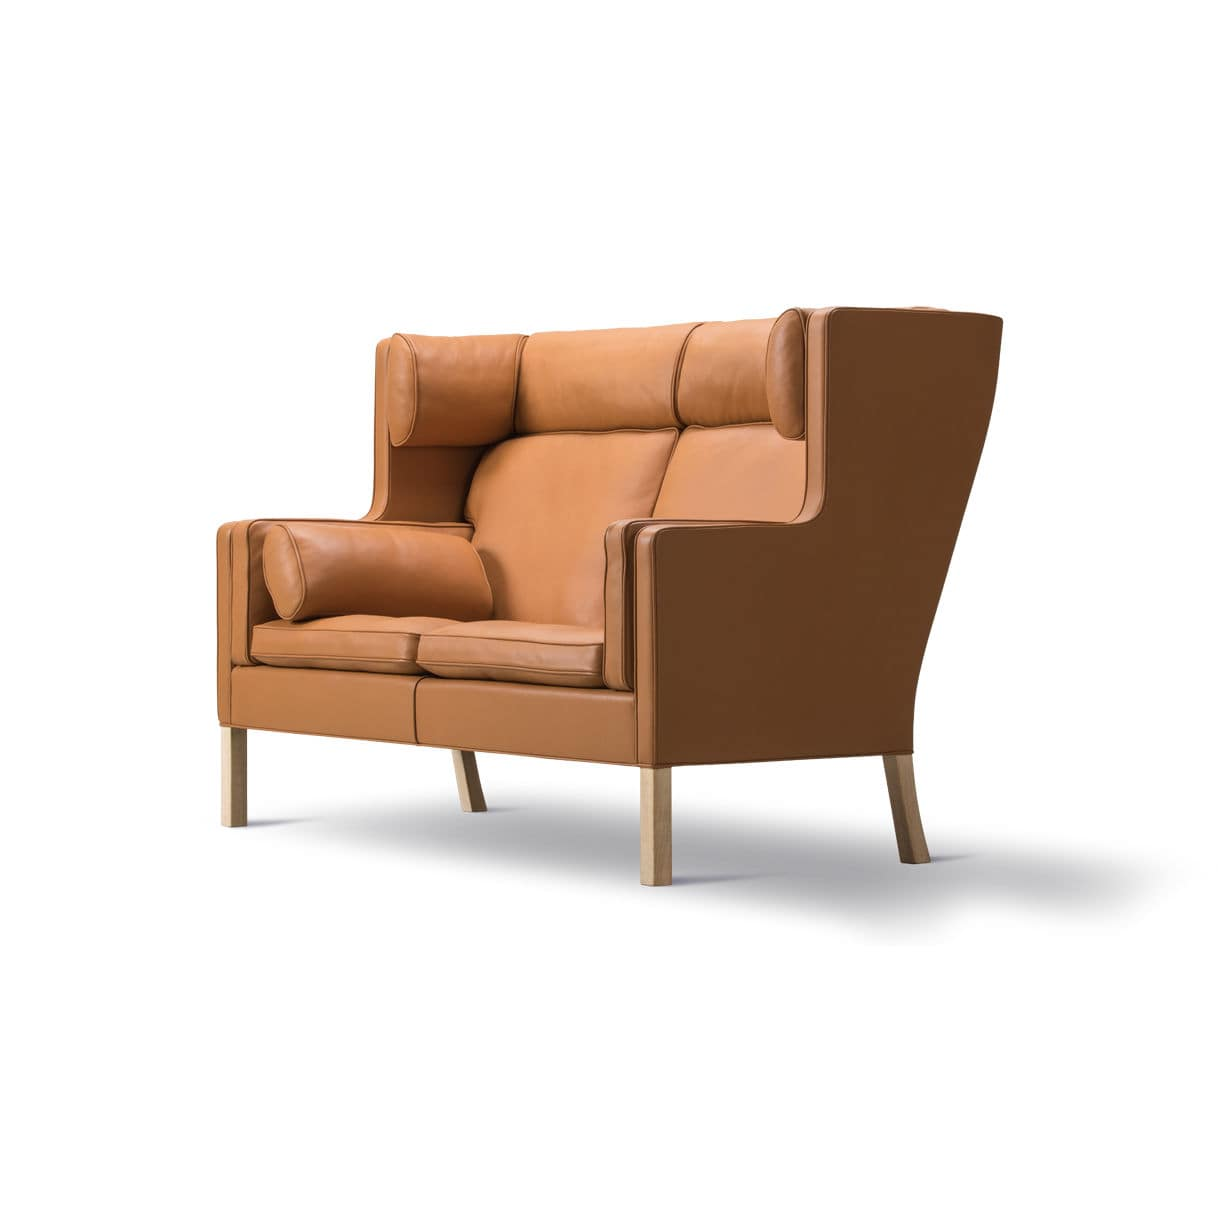 Scandinavian Design Sofa Leather Oak Walnut CoupÉ By Børge Mogensen